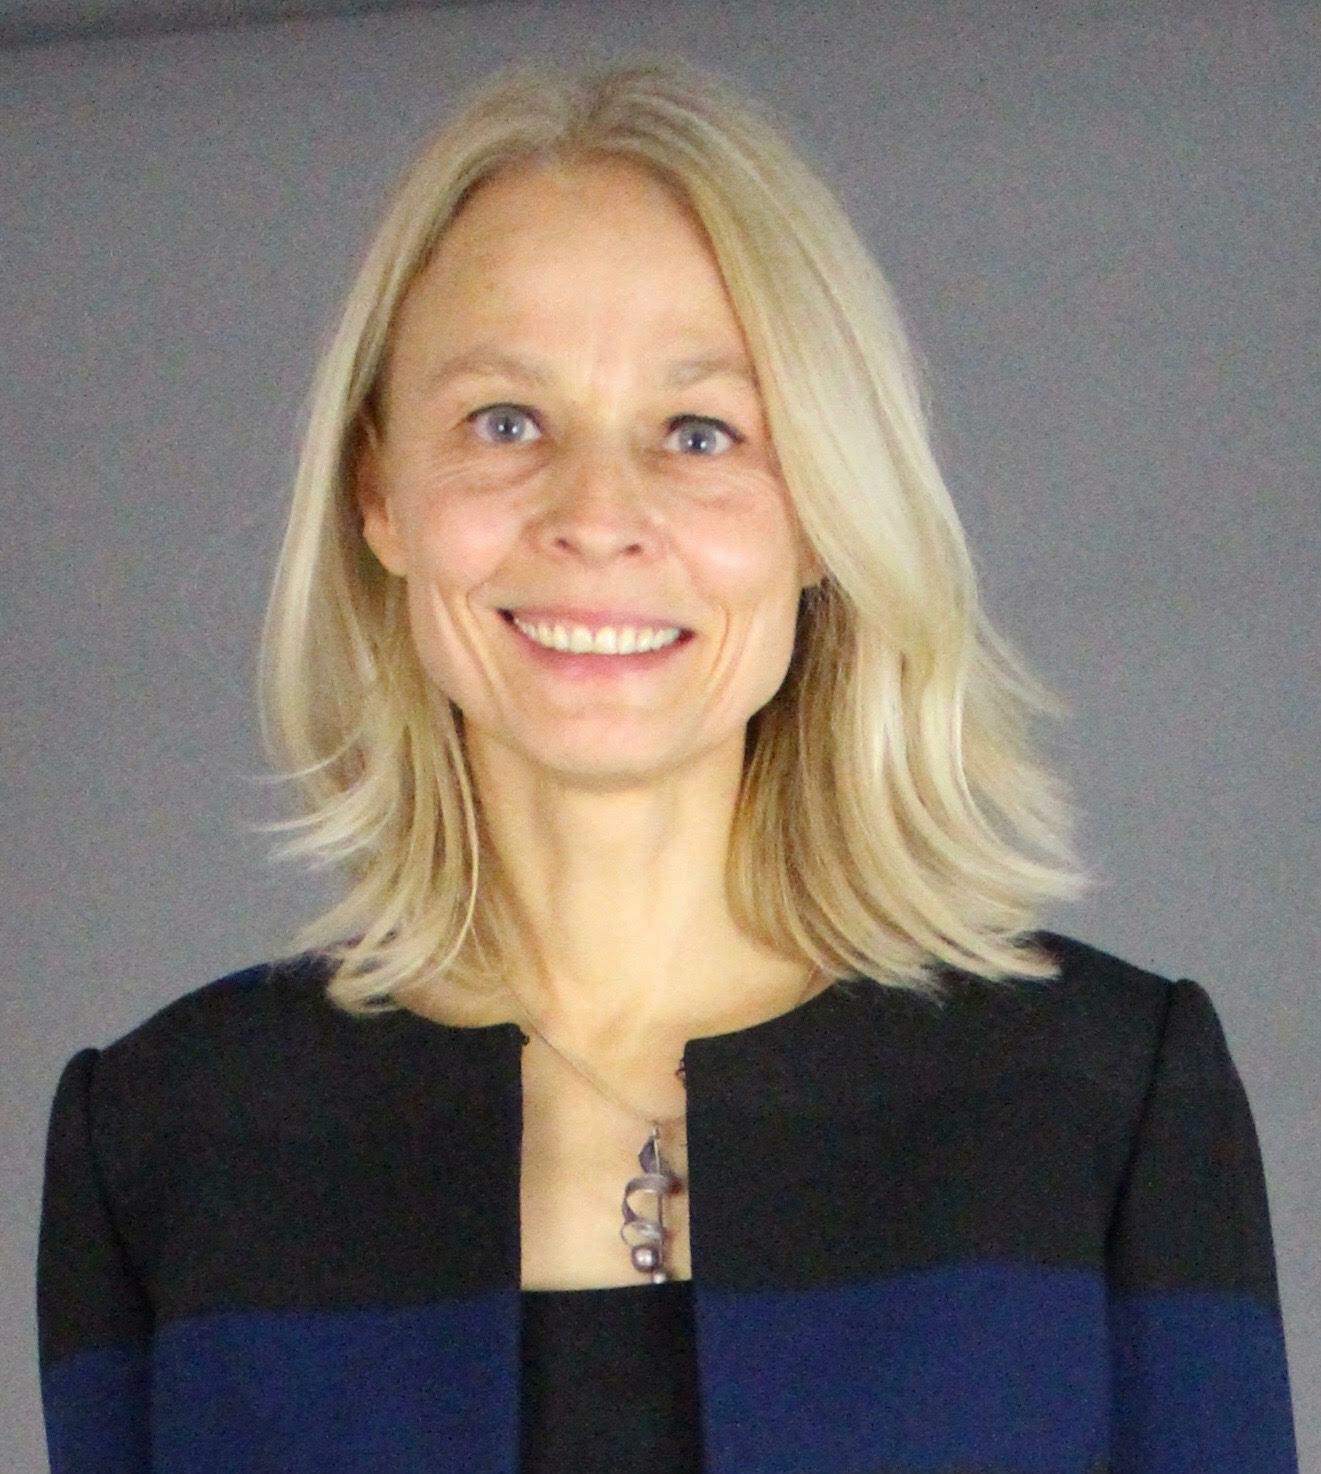 Anja Sassenberg-DeGeorgia